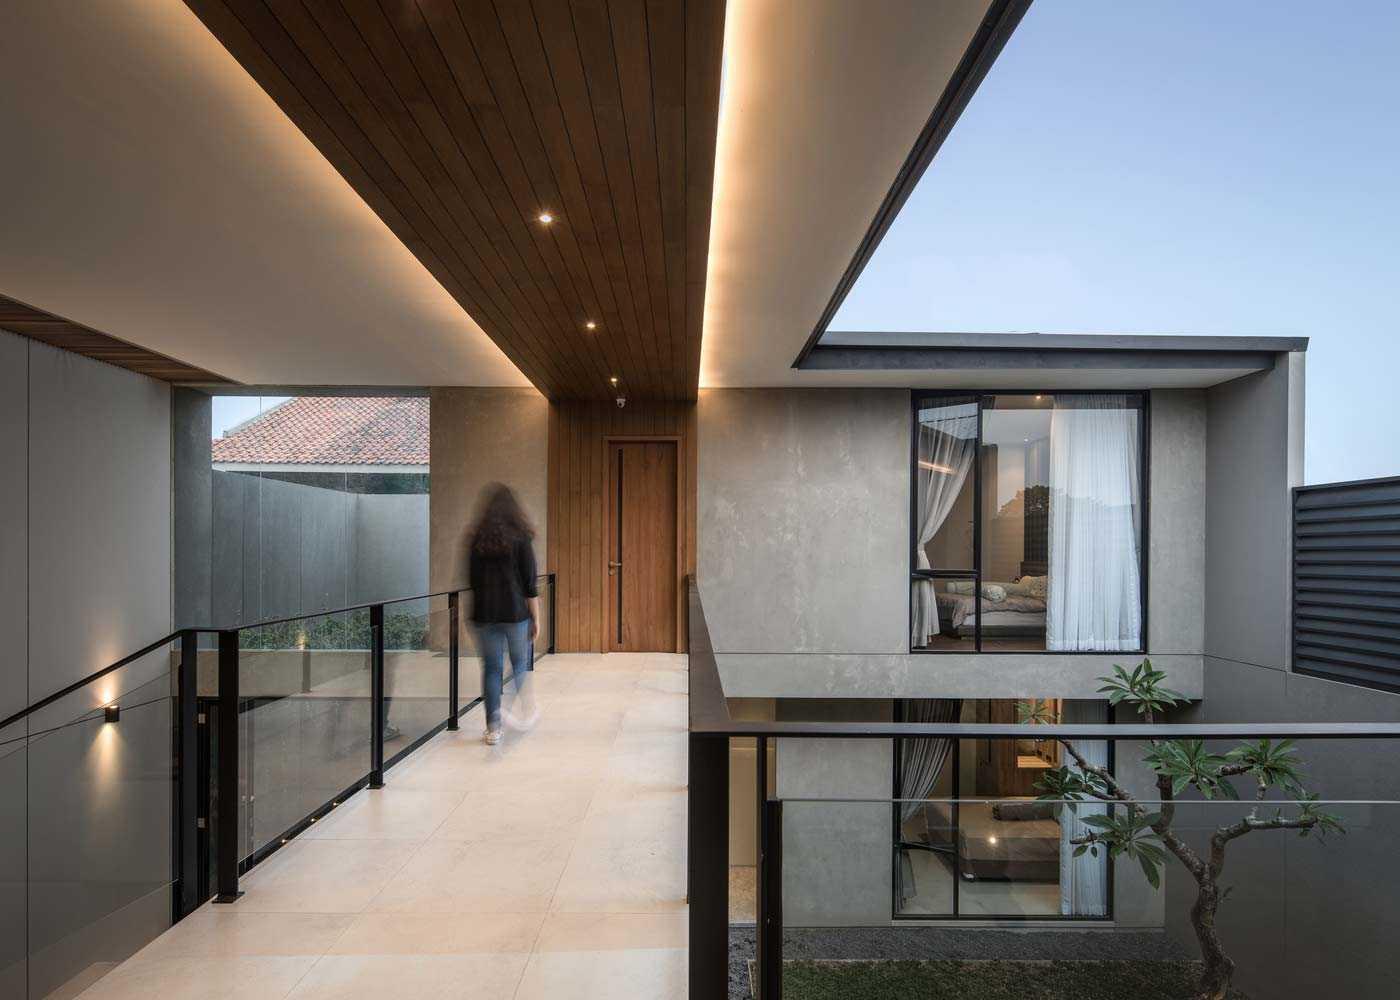 Massa bangunan seolah dibagi-bagi sehingga memberi ruang bukaan di bagian penghubung, karya RuangRona, viaarchdaily.com